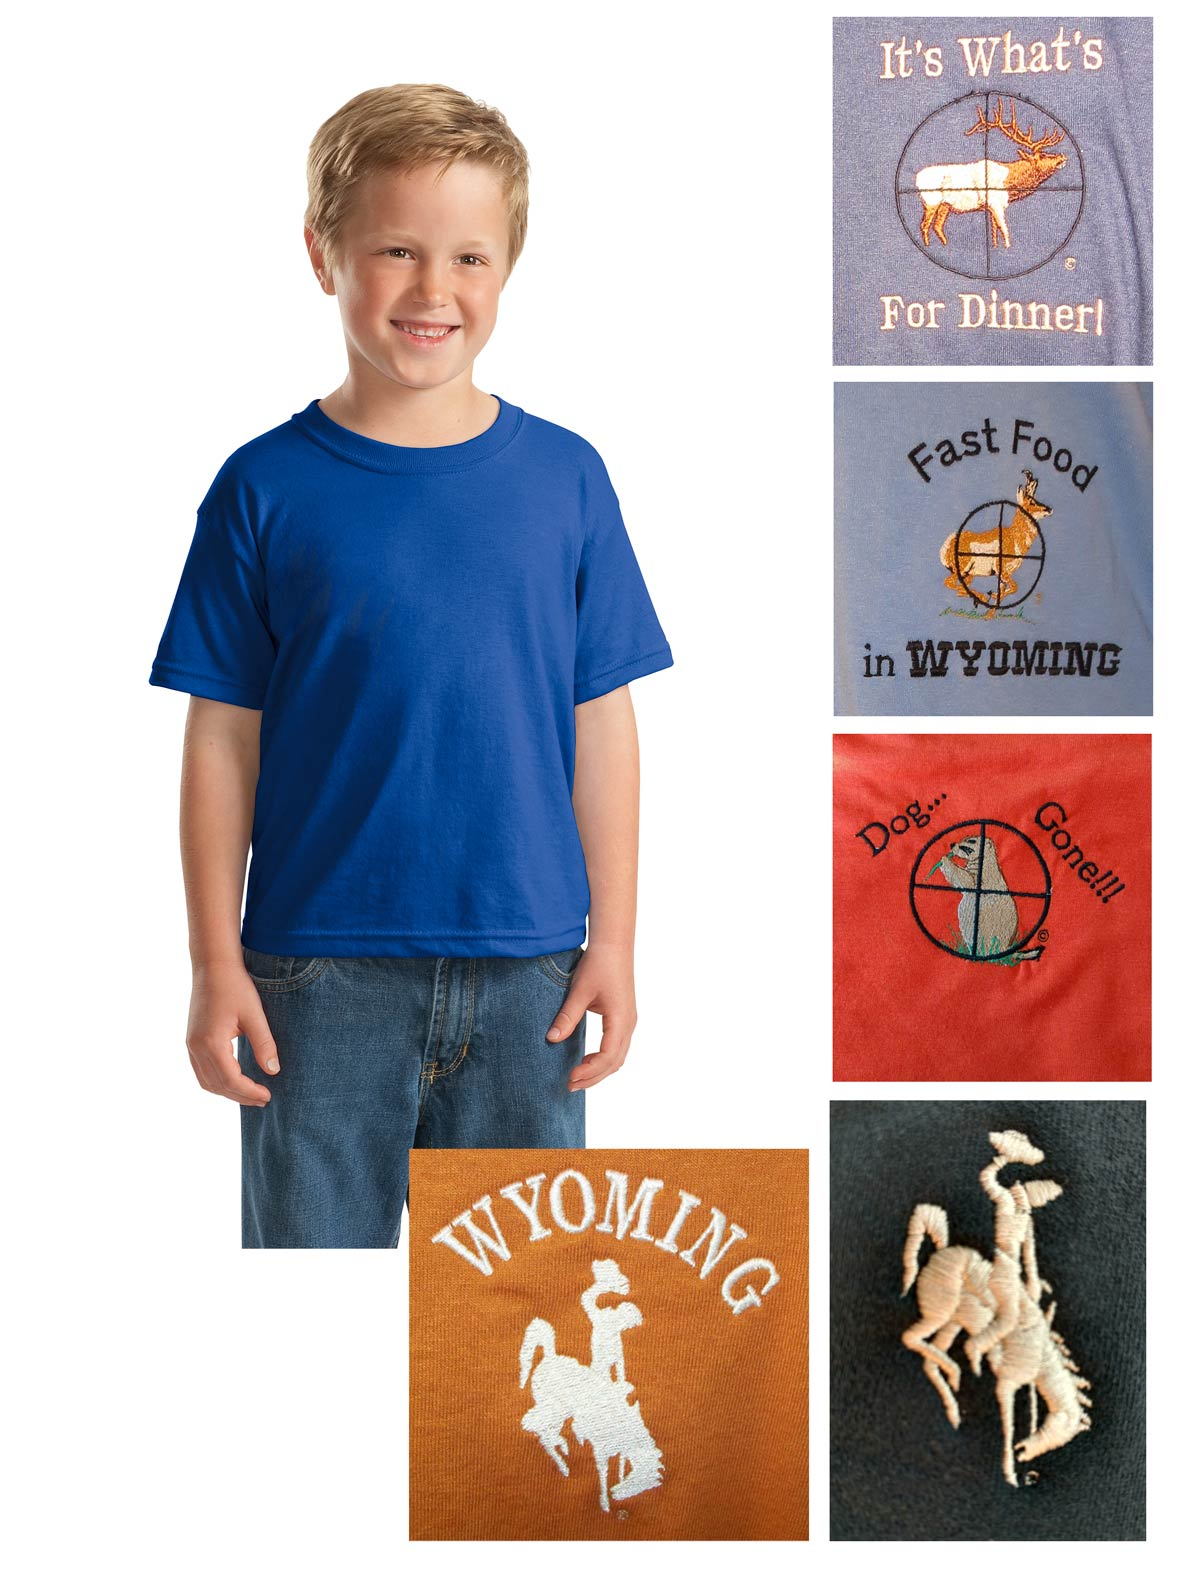 Youth custom cotton blend t-shirt